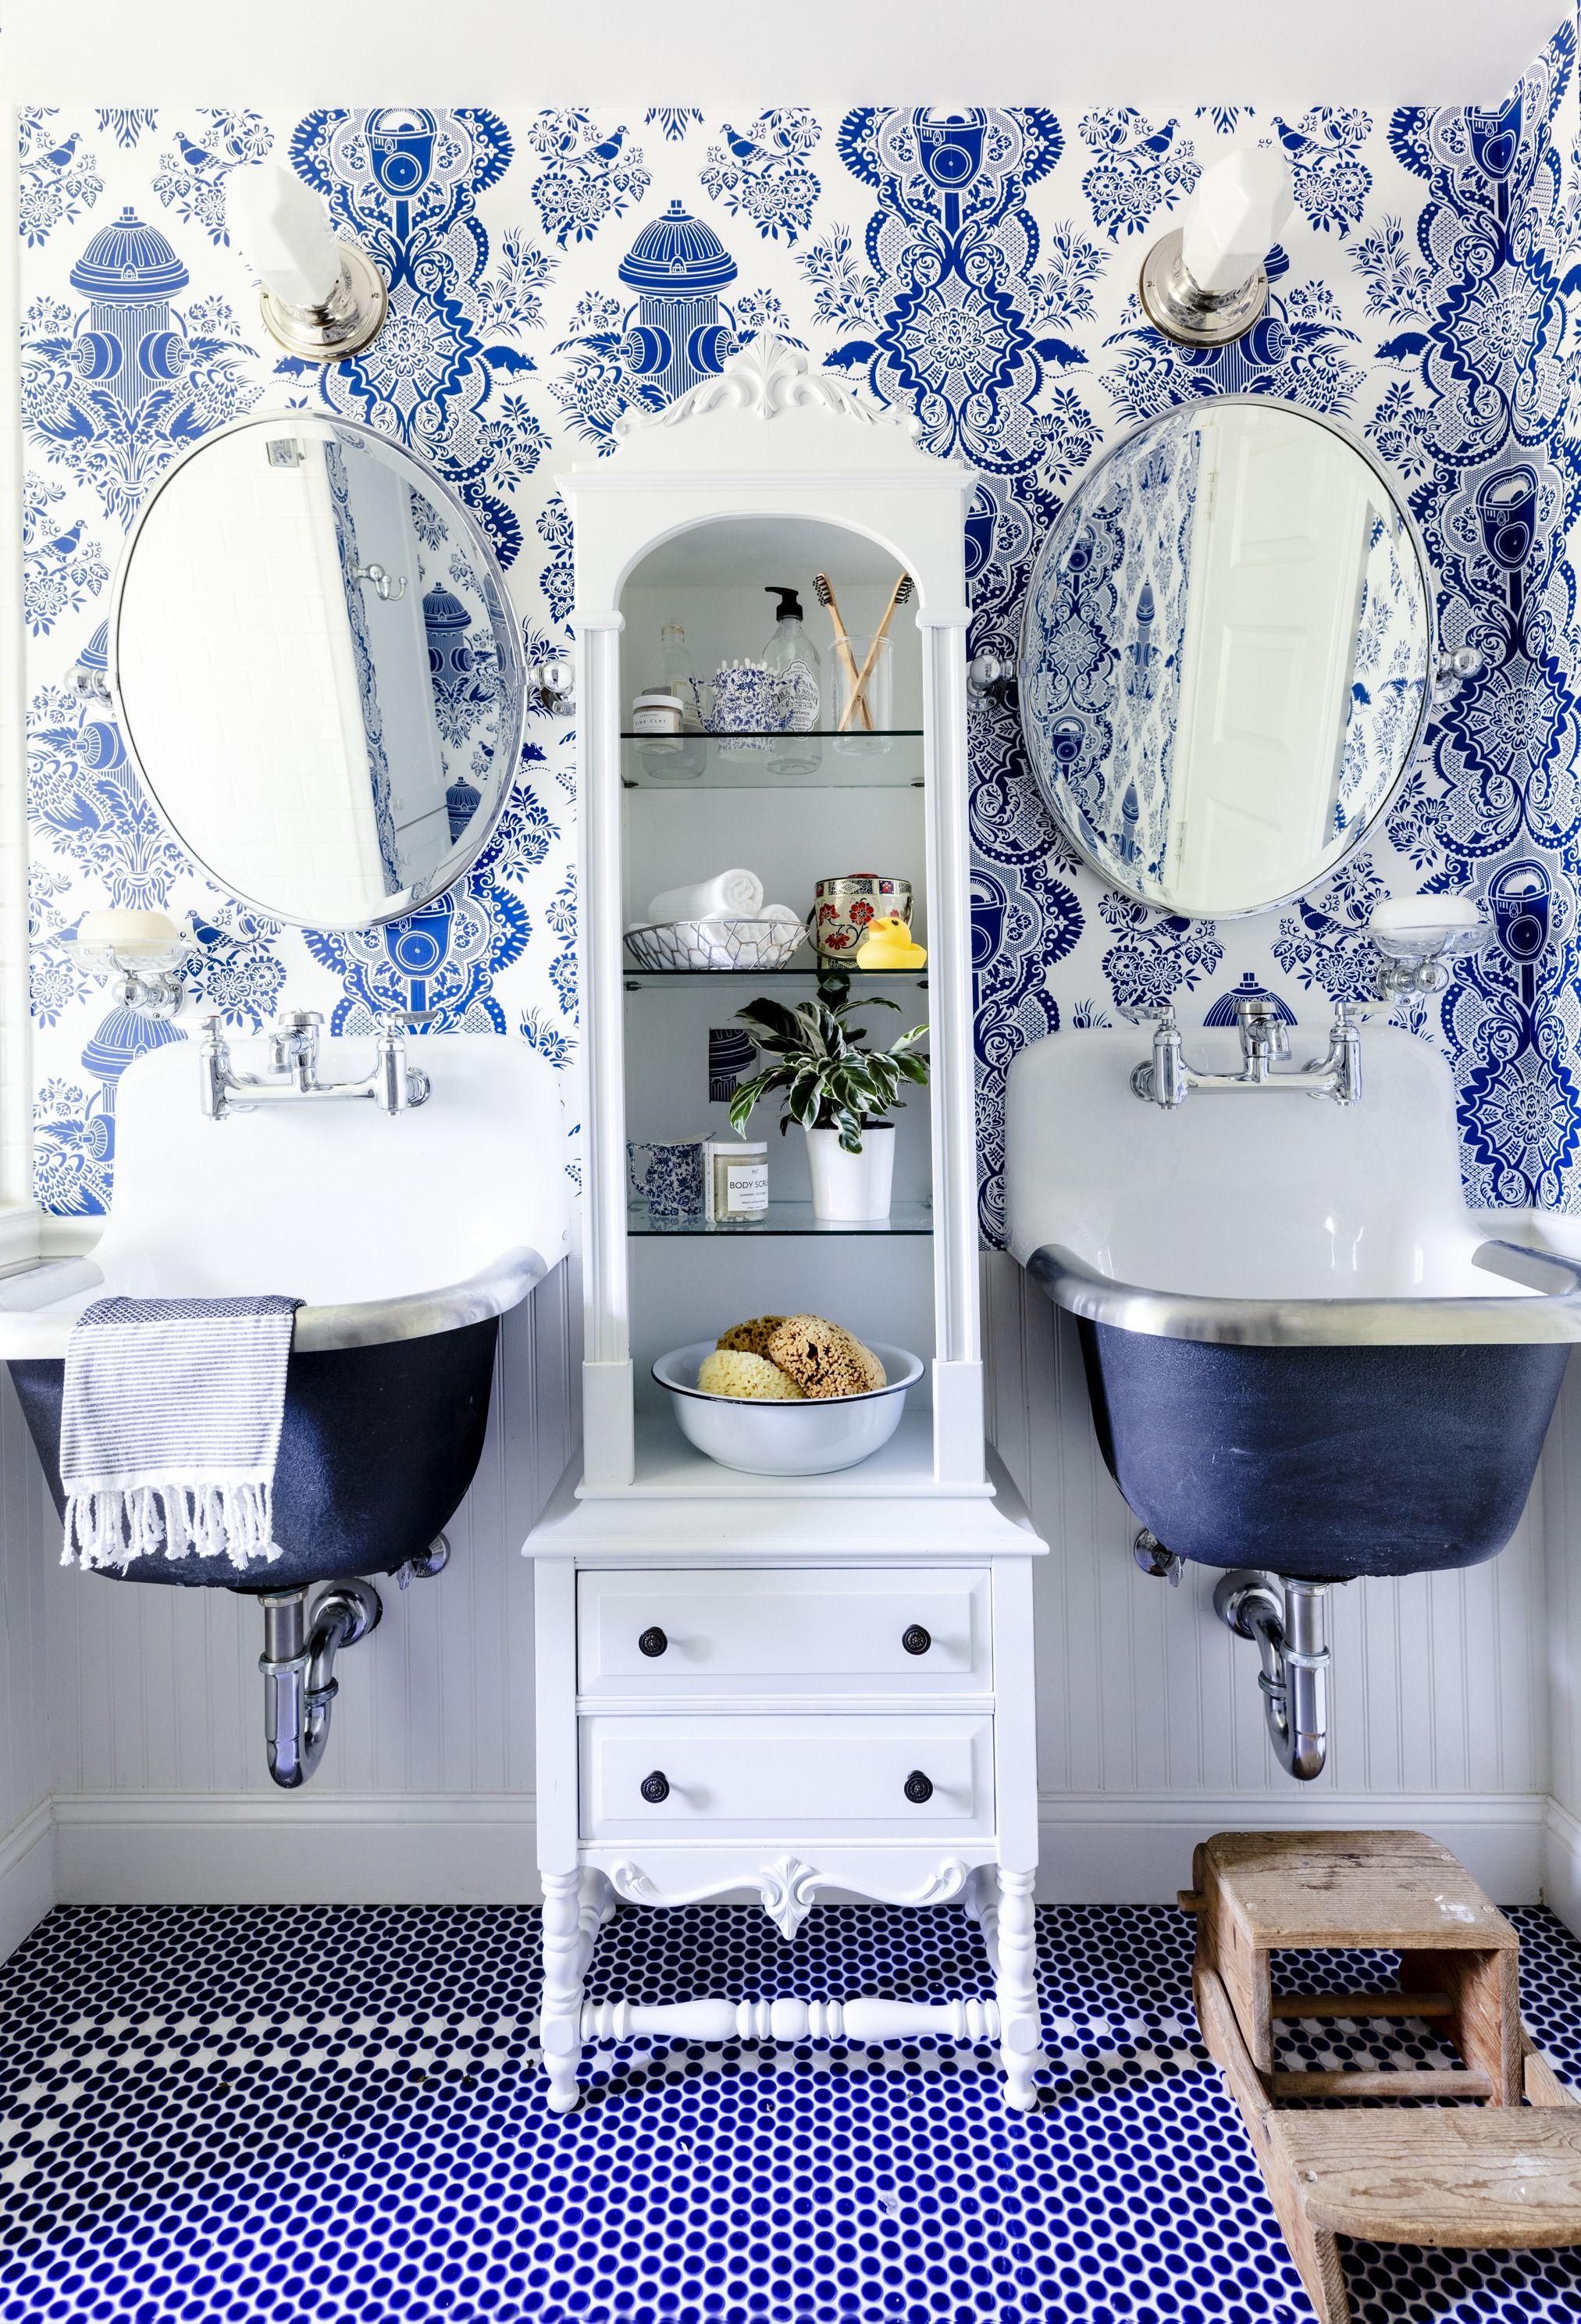 25 Bathroom Wallpaper Ideas Best Wallpaper For Bathrooms